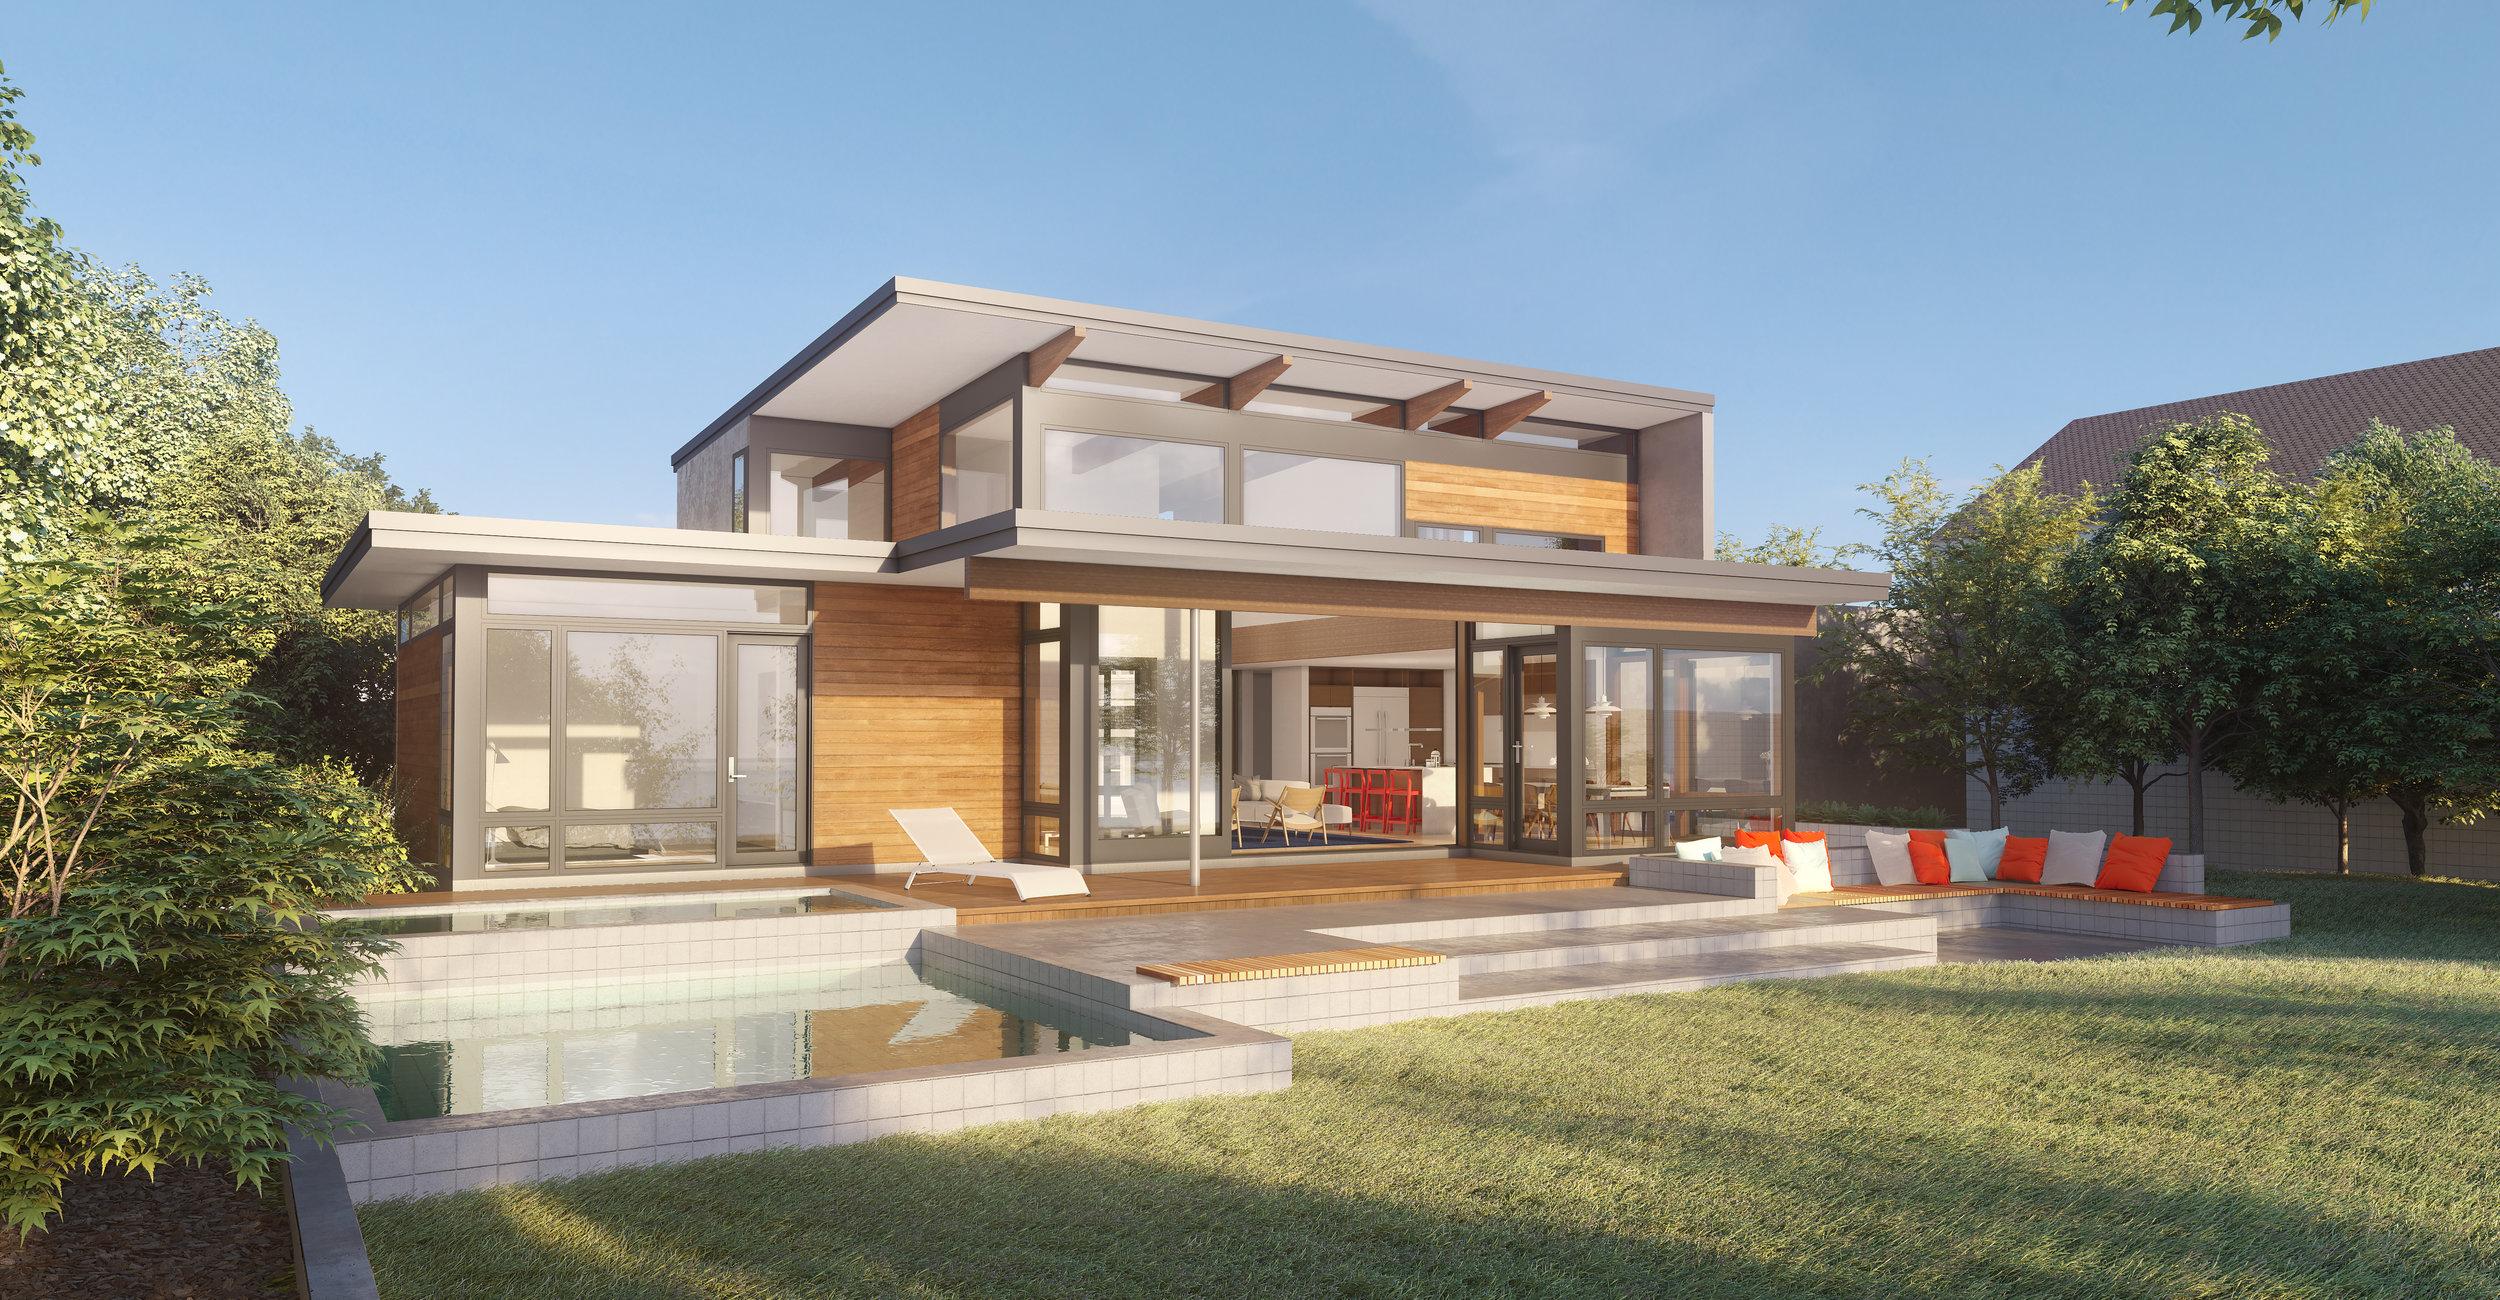 turkel_design_modern_prefab_home_axiom_series_rendering_axiom1850_exterior.jpg